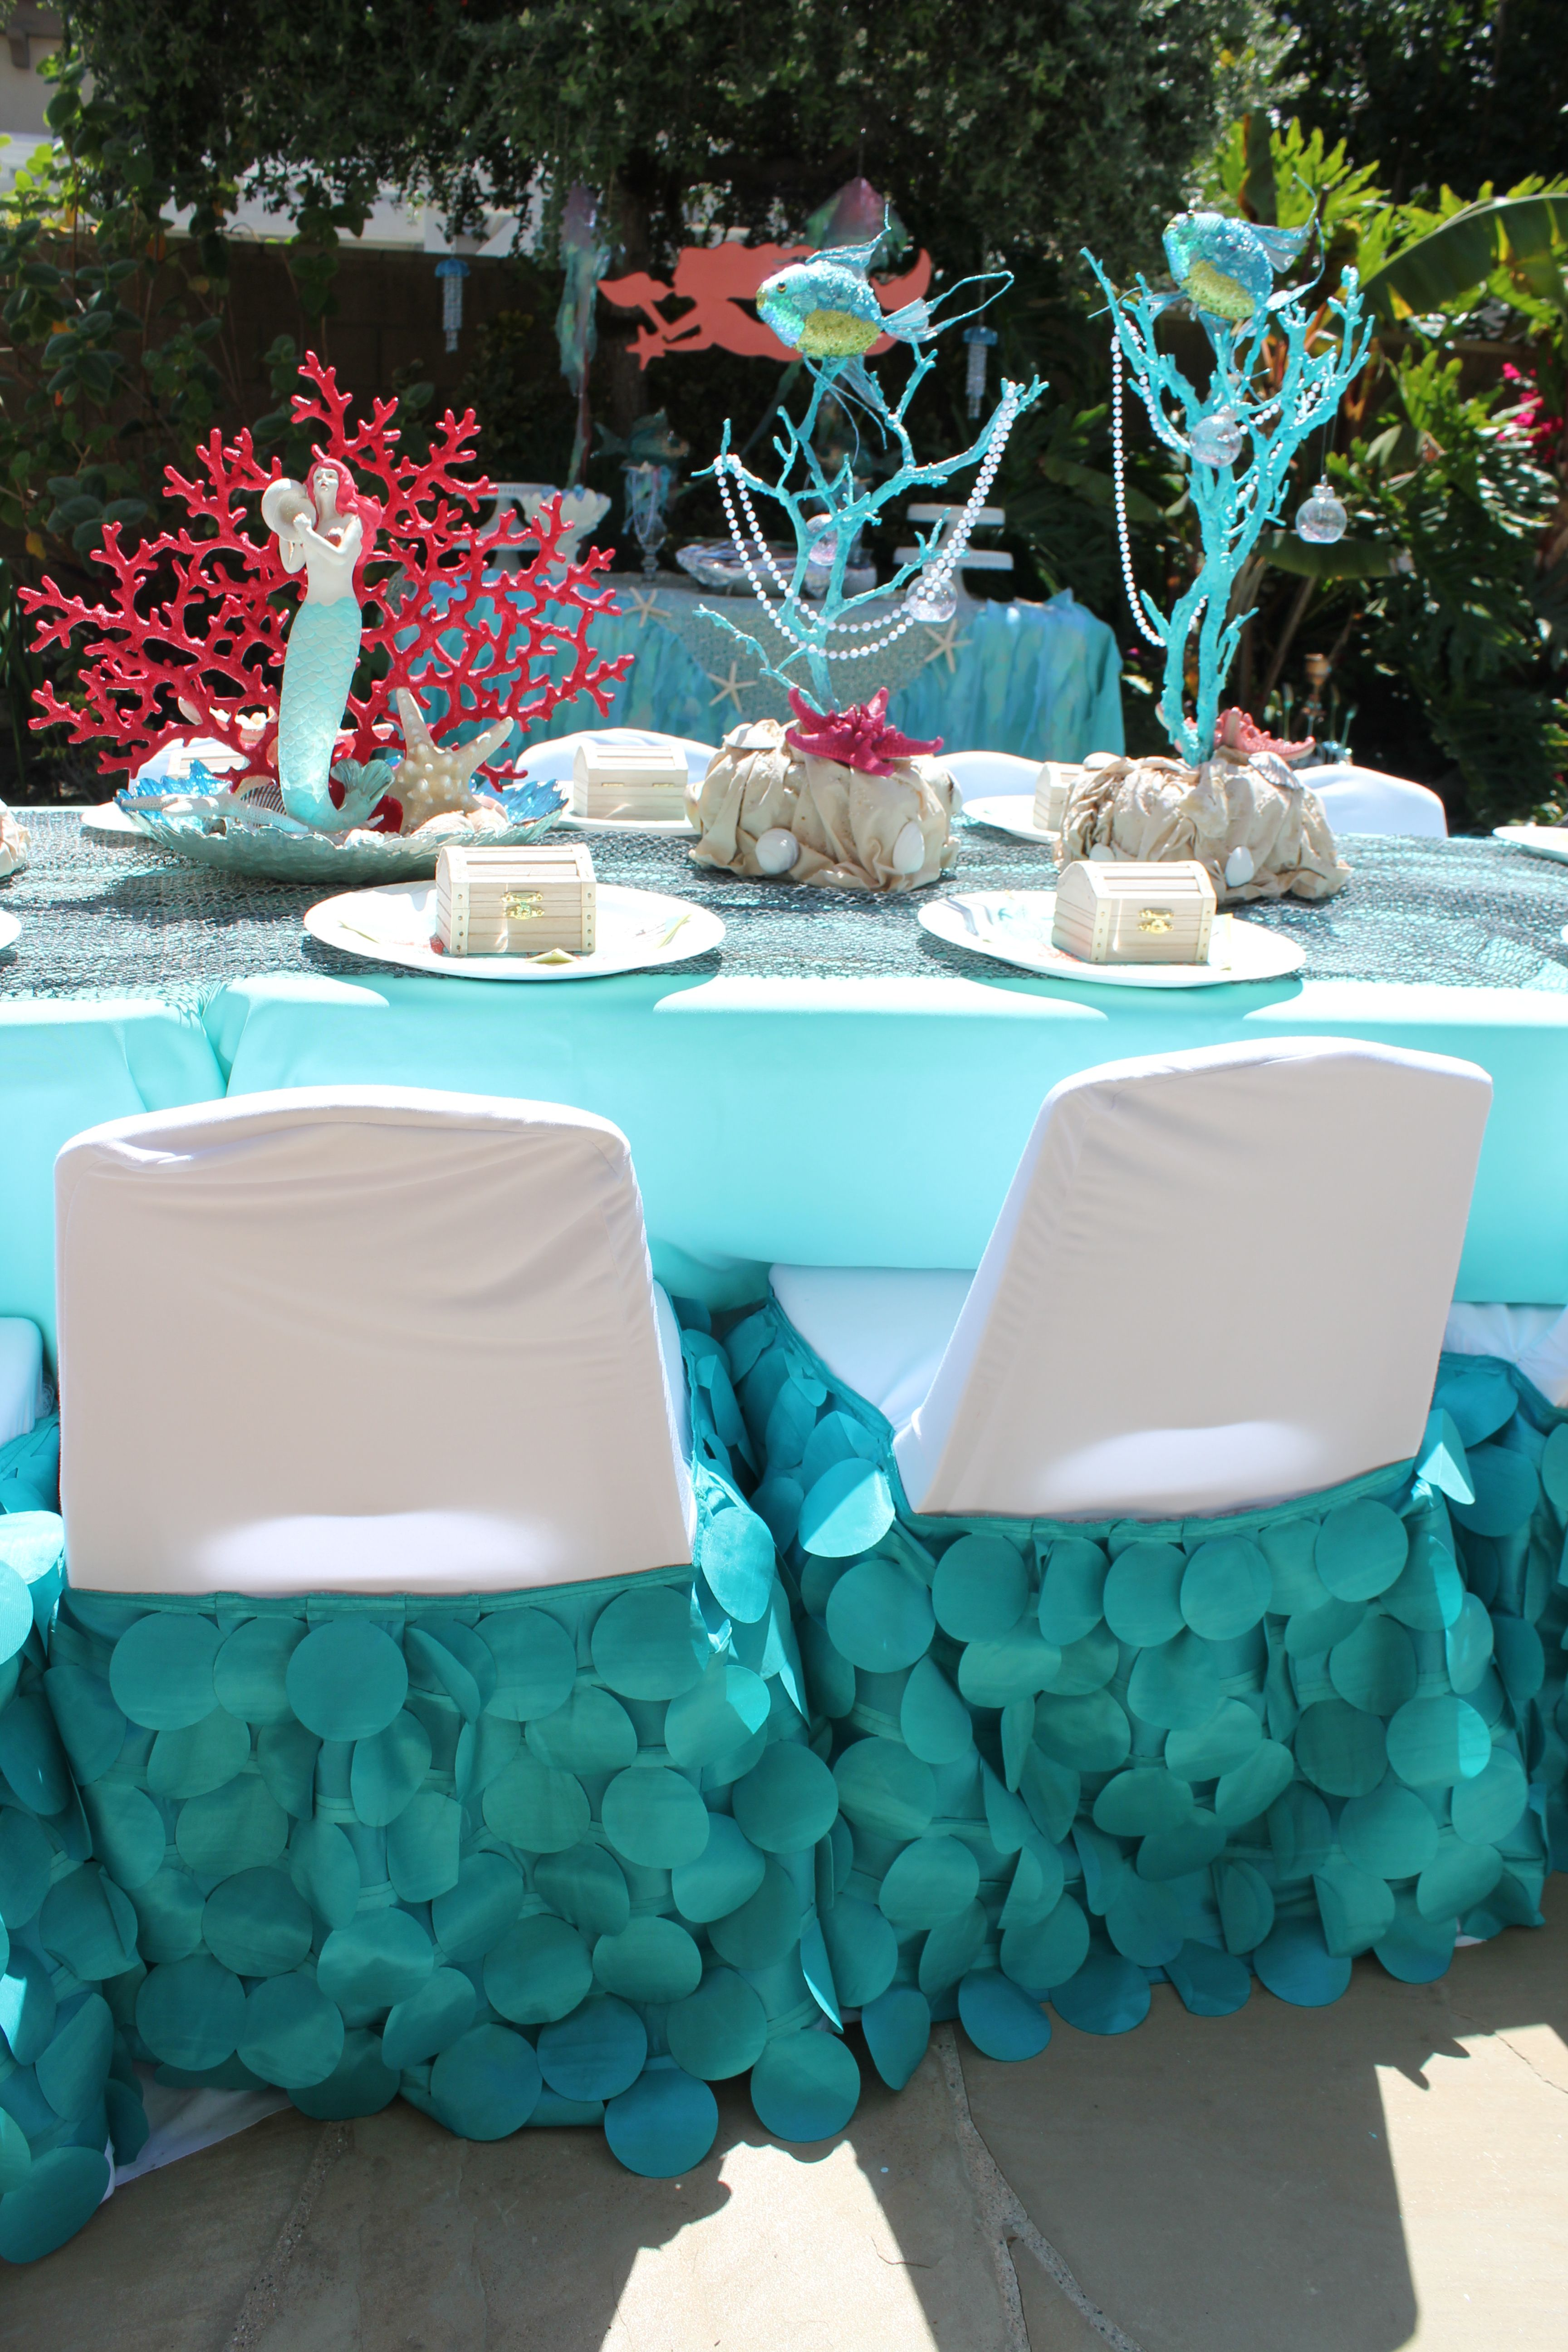 Mermaid bachelorette party Mermaid decor Under the sea Fishnets